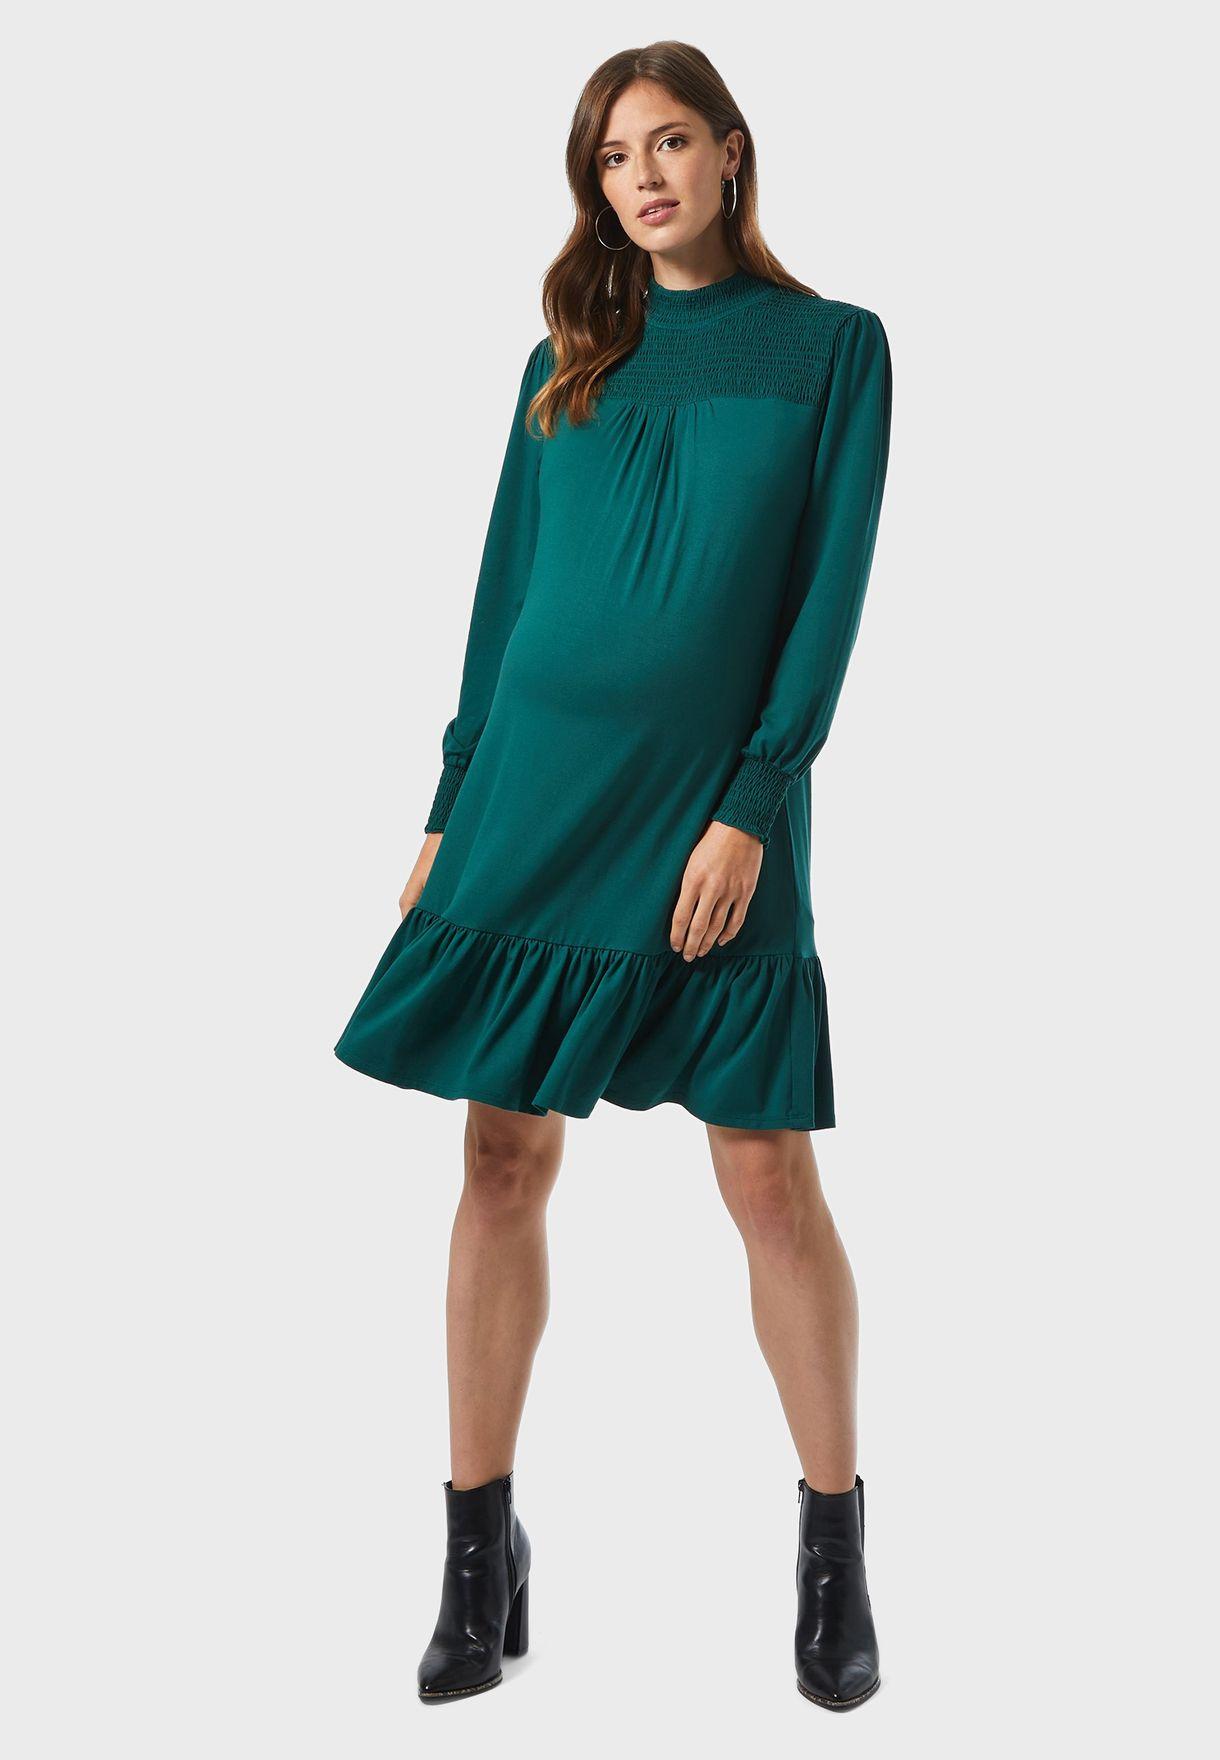 Shirred Yoke Dress